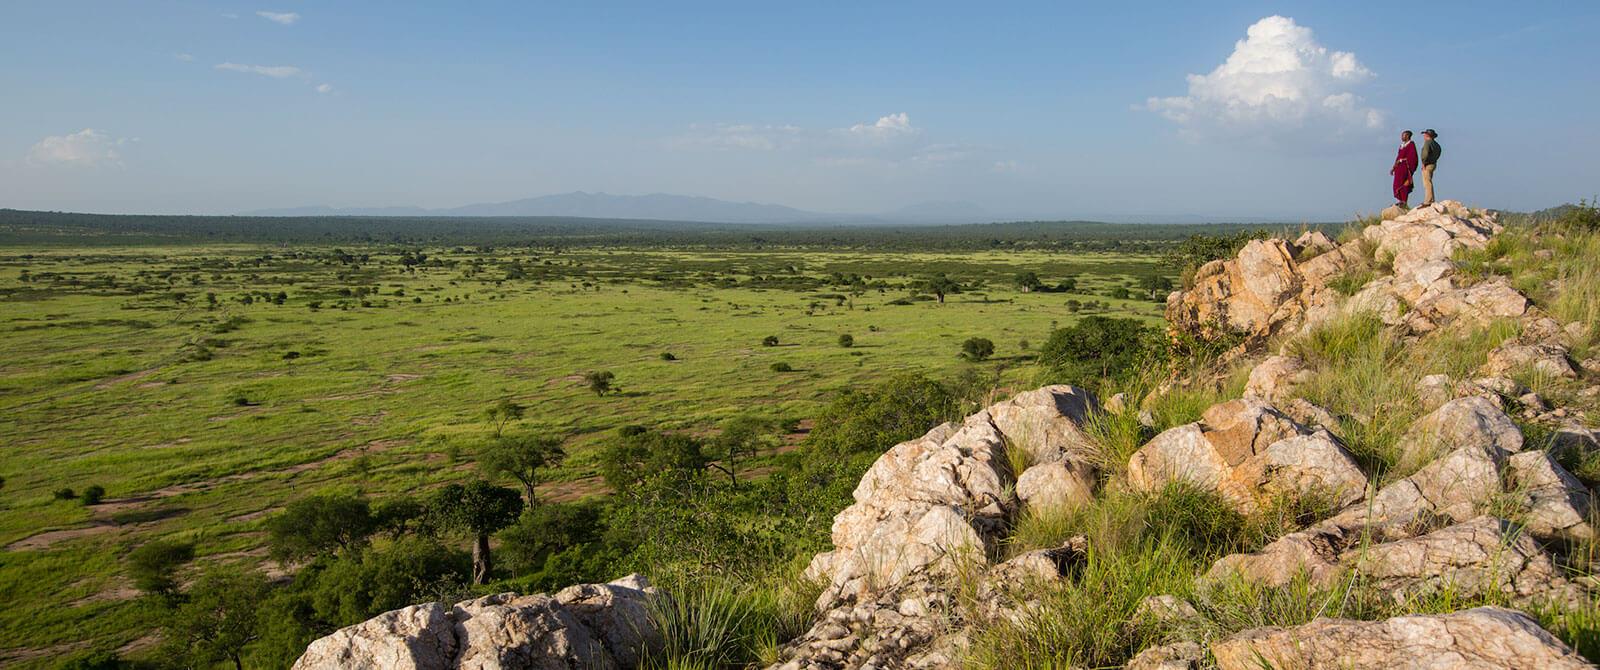 Views of the Wilderness - Tarangire Treetops Lodge - Tanzania Safari Honeymoon